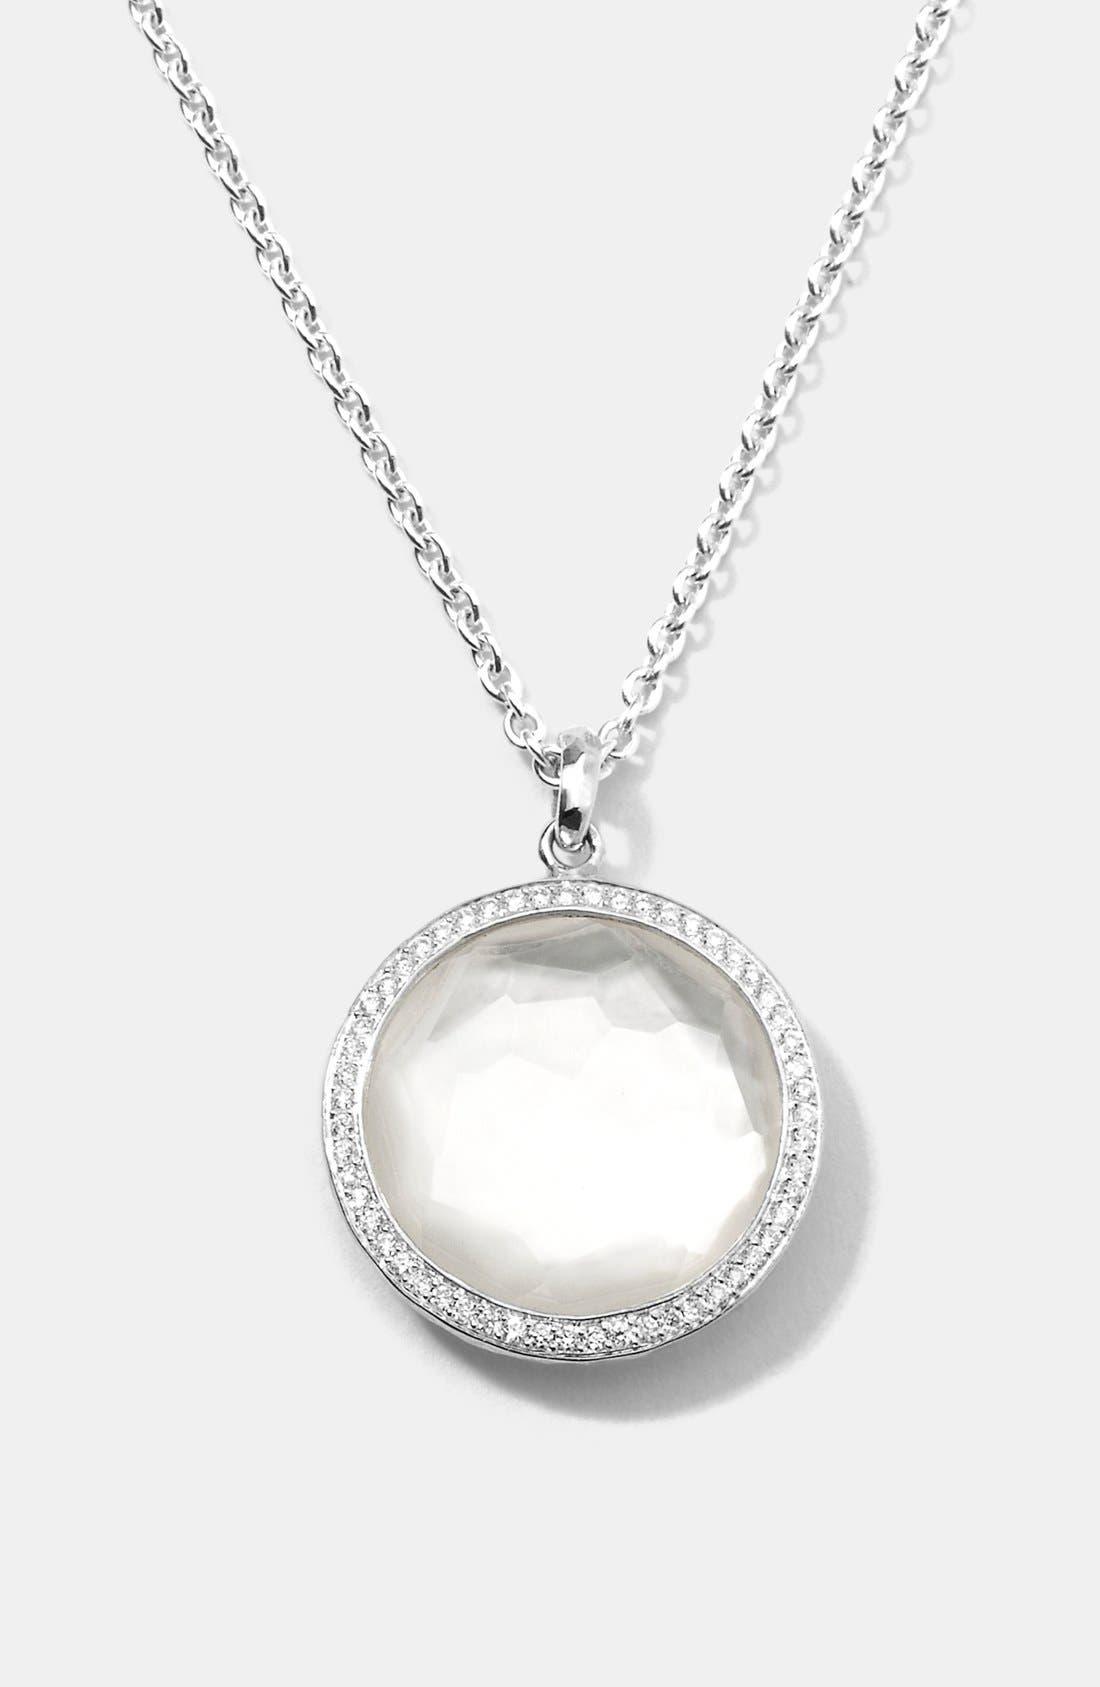 Main Image - Ippolita 'Stella' Pendant Necklace